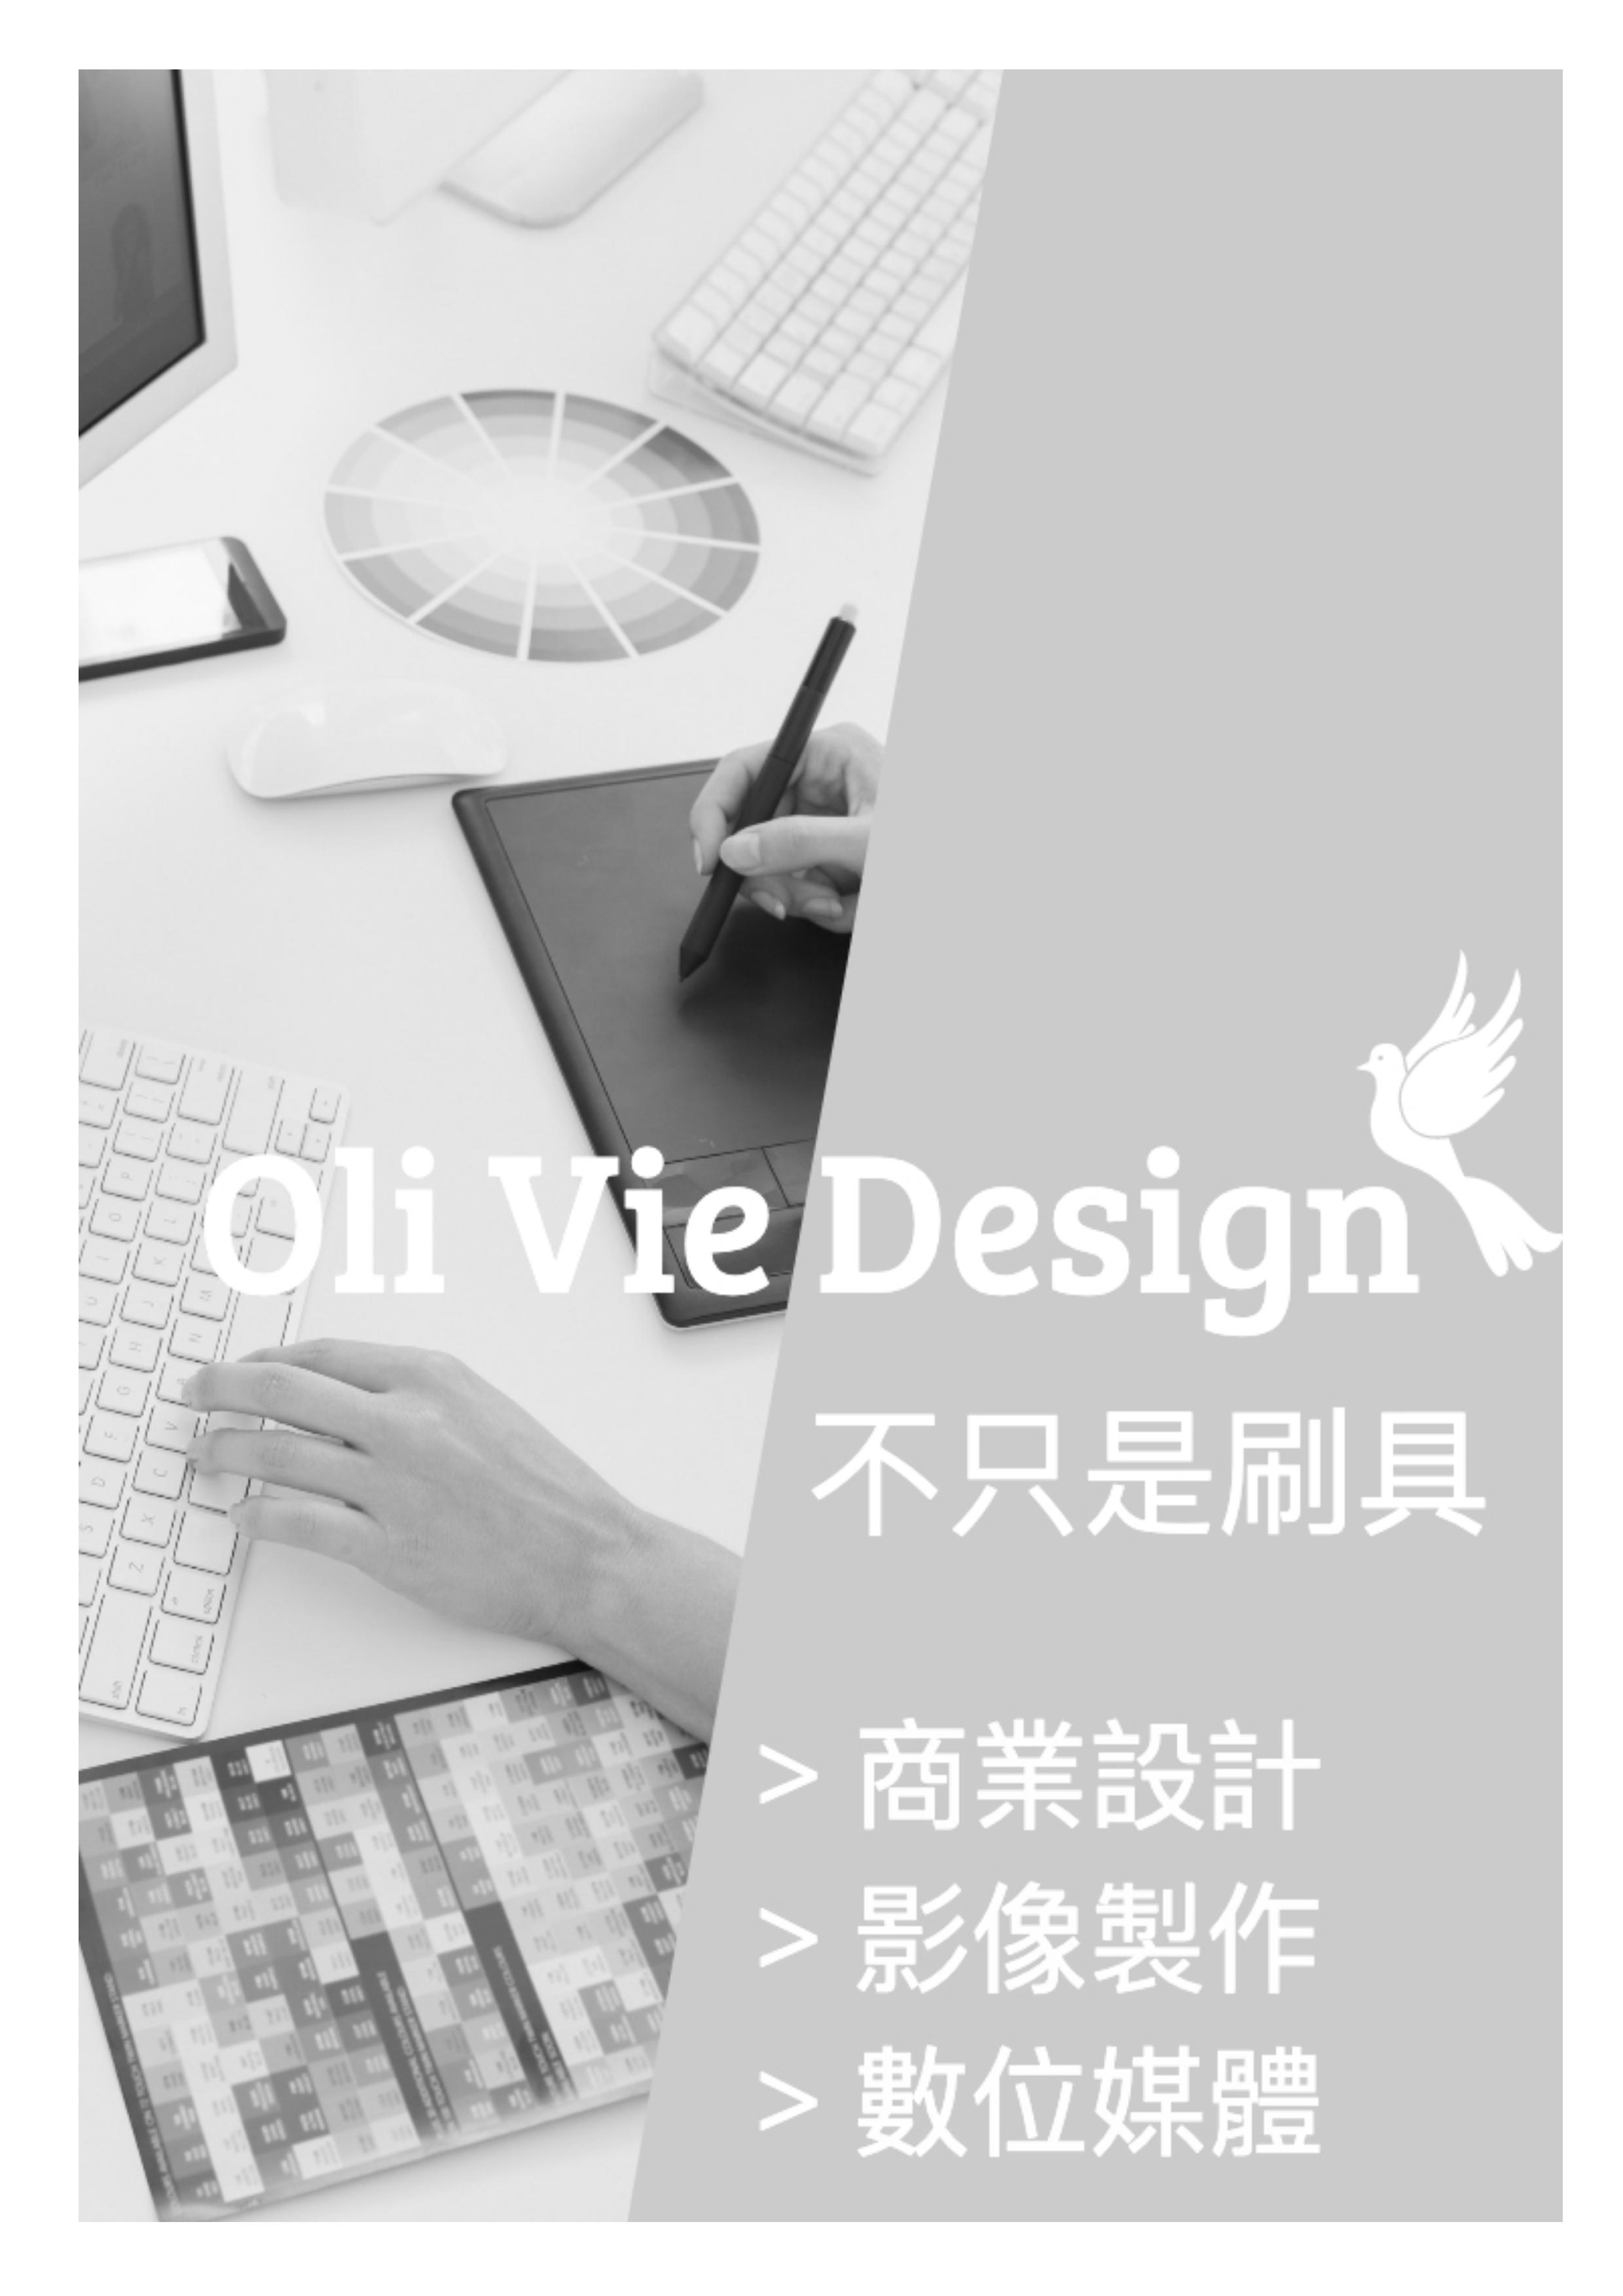 Oli Vie Design,歐妞設計,商業文案,平面設計,活動文案,影片製作,拍影片,平面拍攝,拍產品,品牌故事,包裝設計,LOGO設計,DM設計,網頁設計,印刷輸出,展場設計,線下活動,後製,網紅,口碑行銷,KOL,SEO,找小編,社群經營